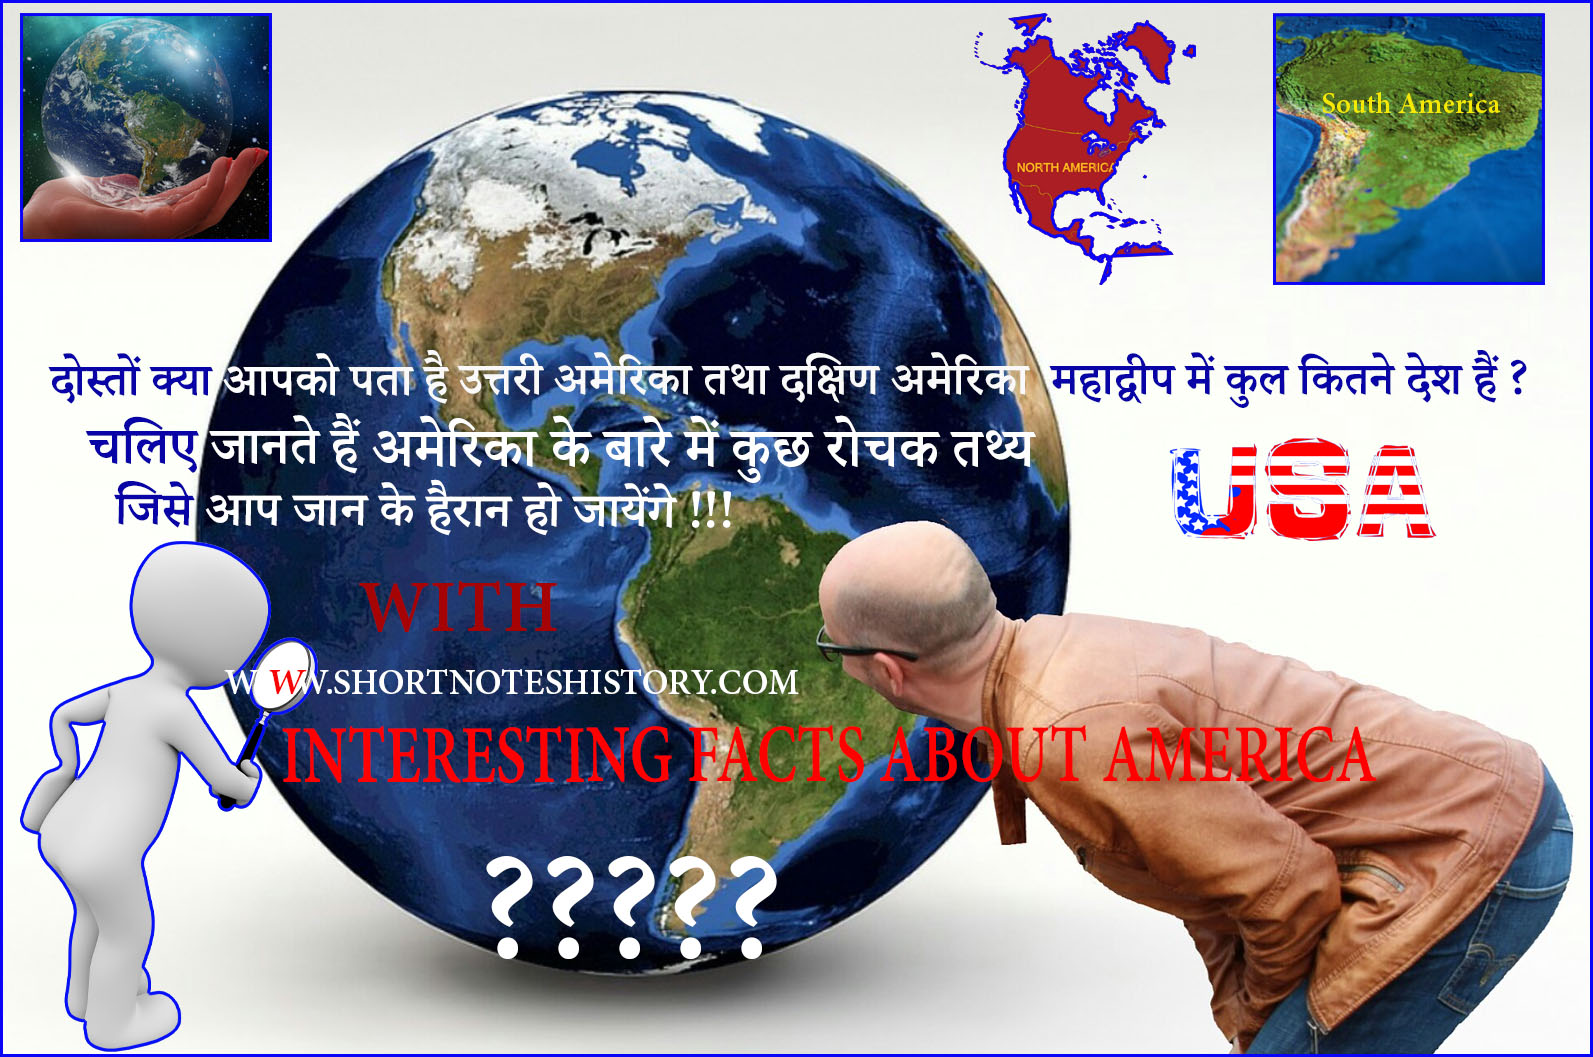 20+Facts About America In Hindi[अमेरिका के बारे में कुछ रोचक तथ्य]